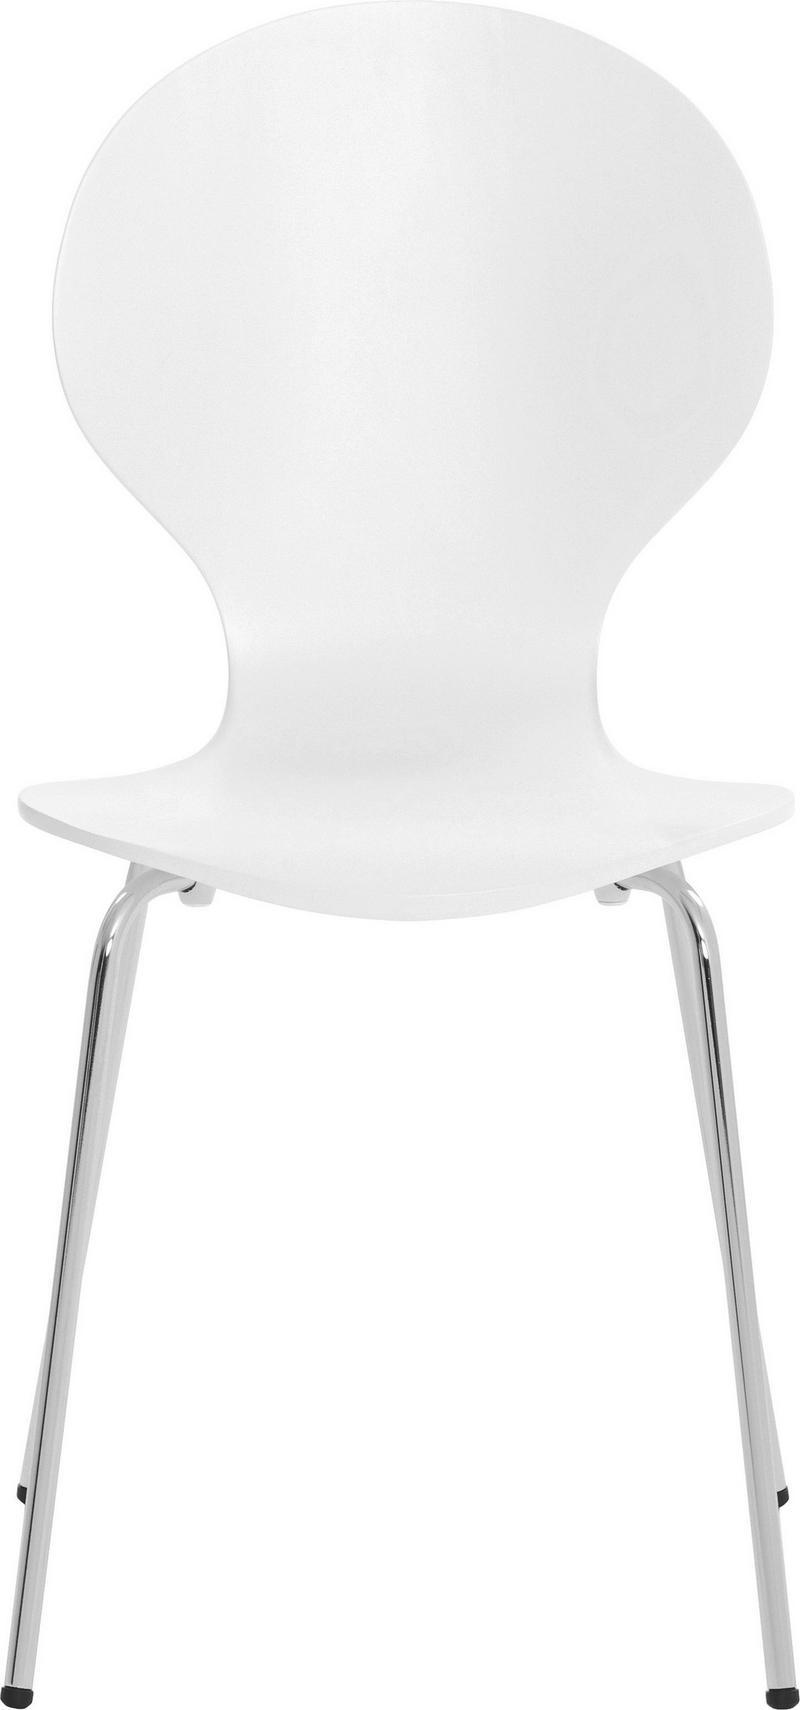 STOL - vit, Design, metall/trä (55,6/87,3/46,2cm) - Low Price